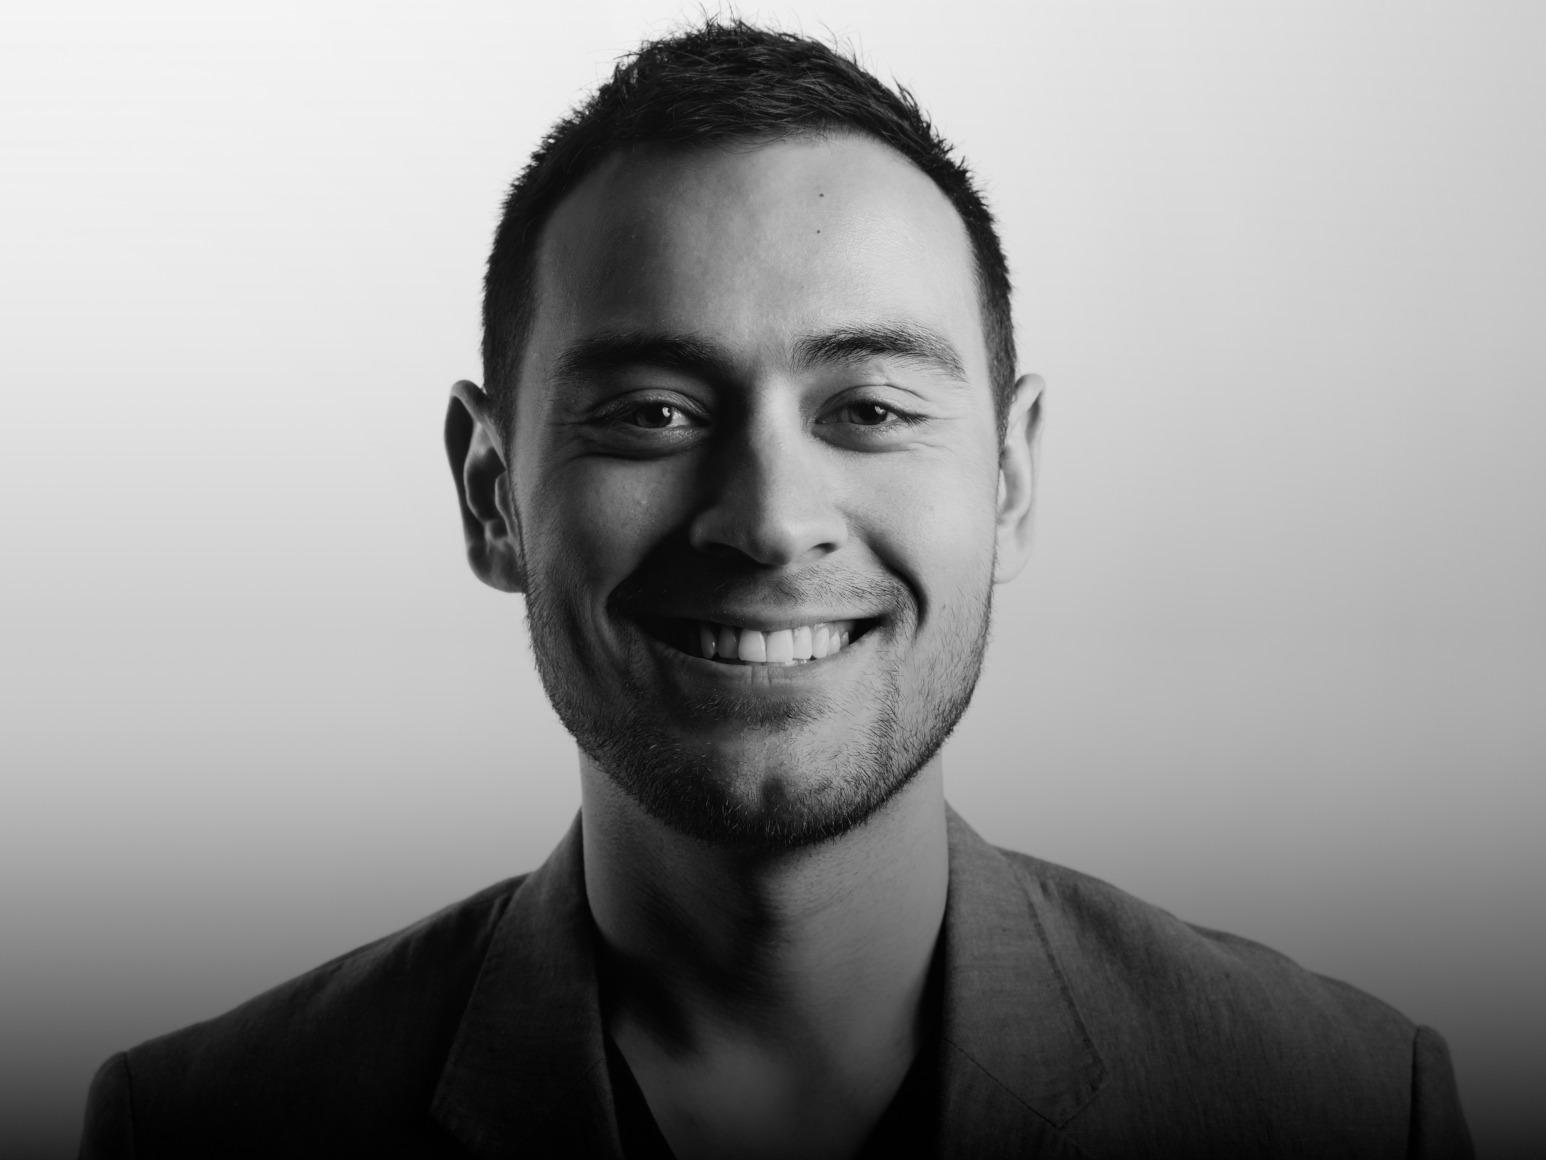 Image of Niko DeMordaunt